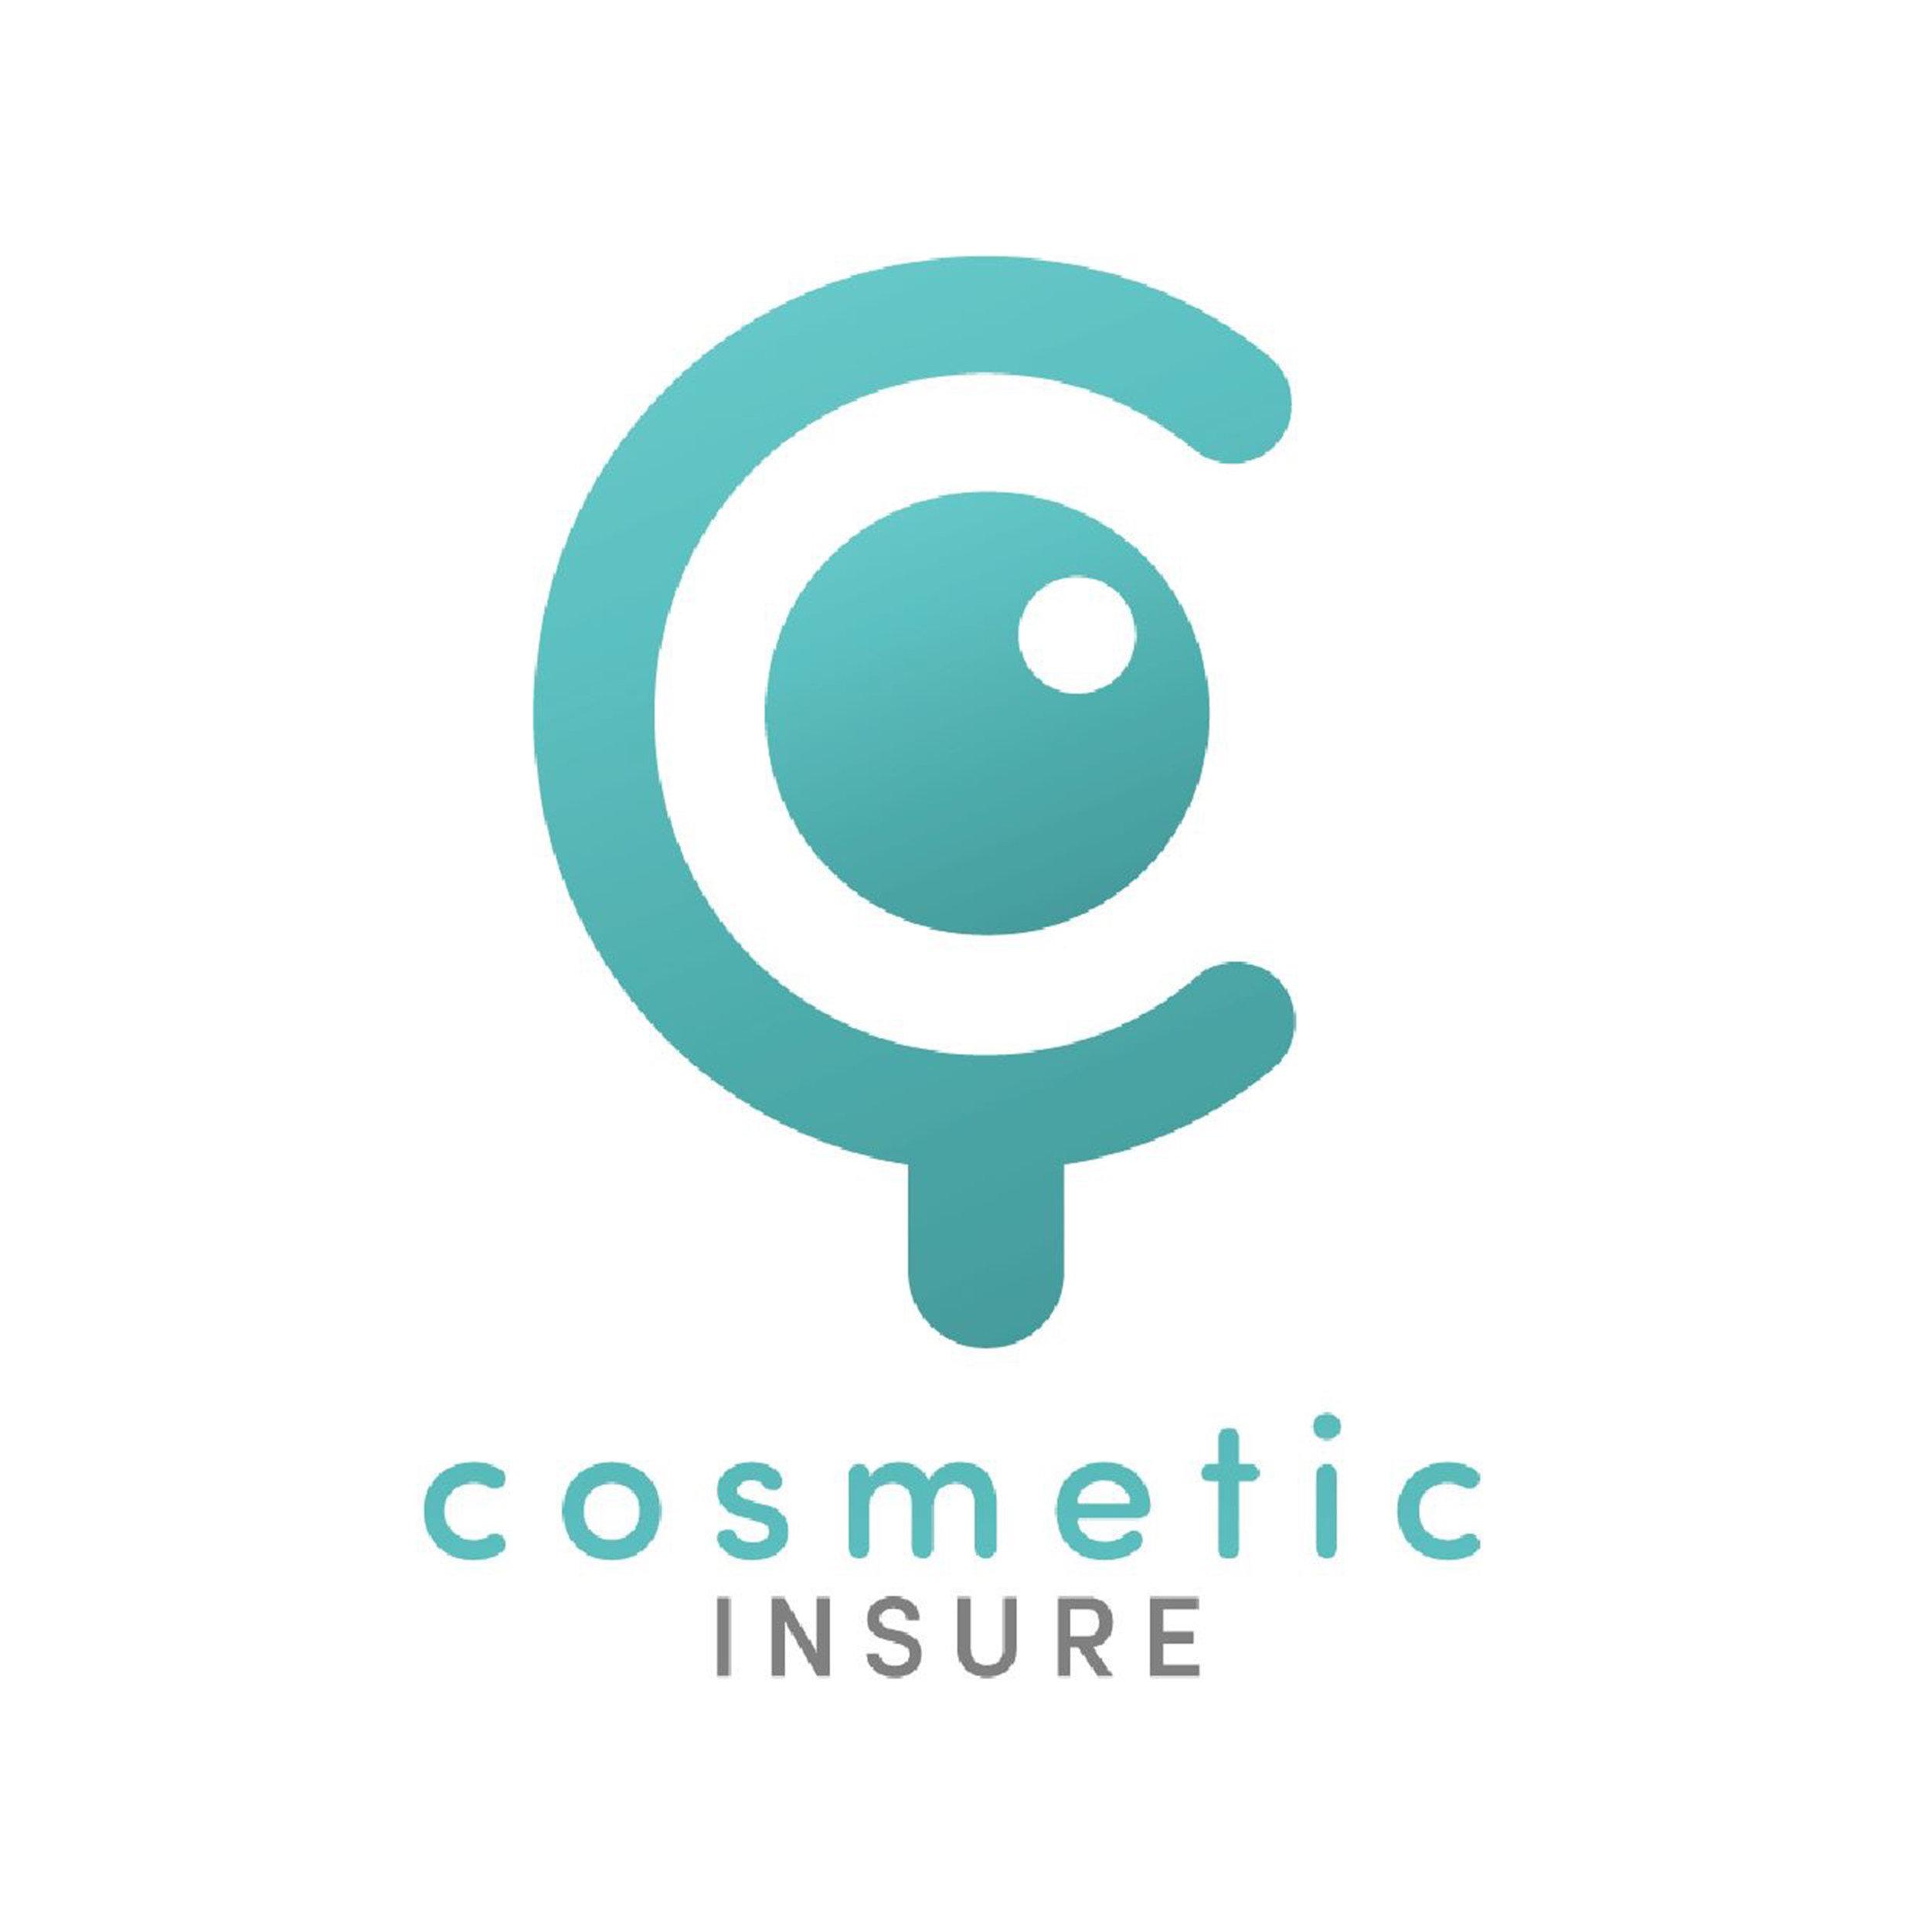 cosmetic-insure.jpg